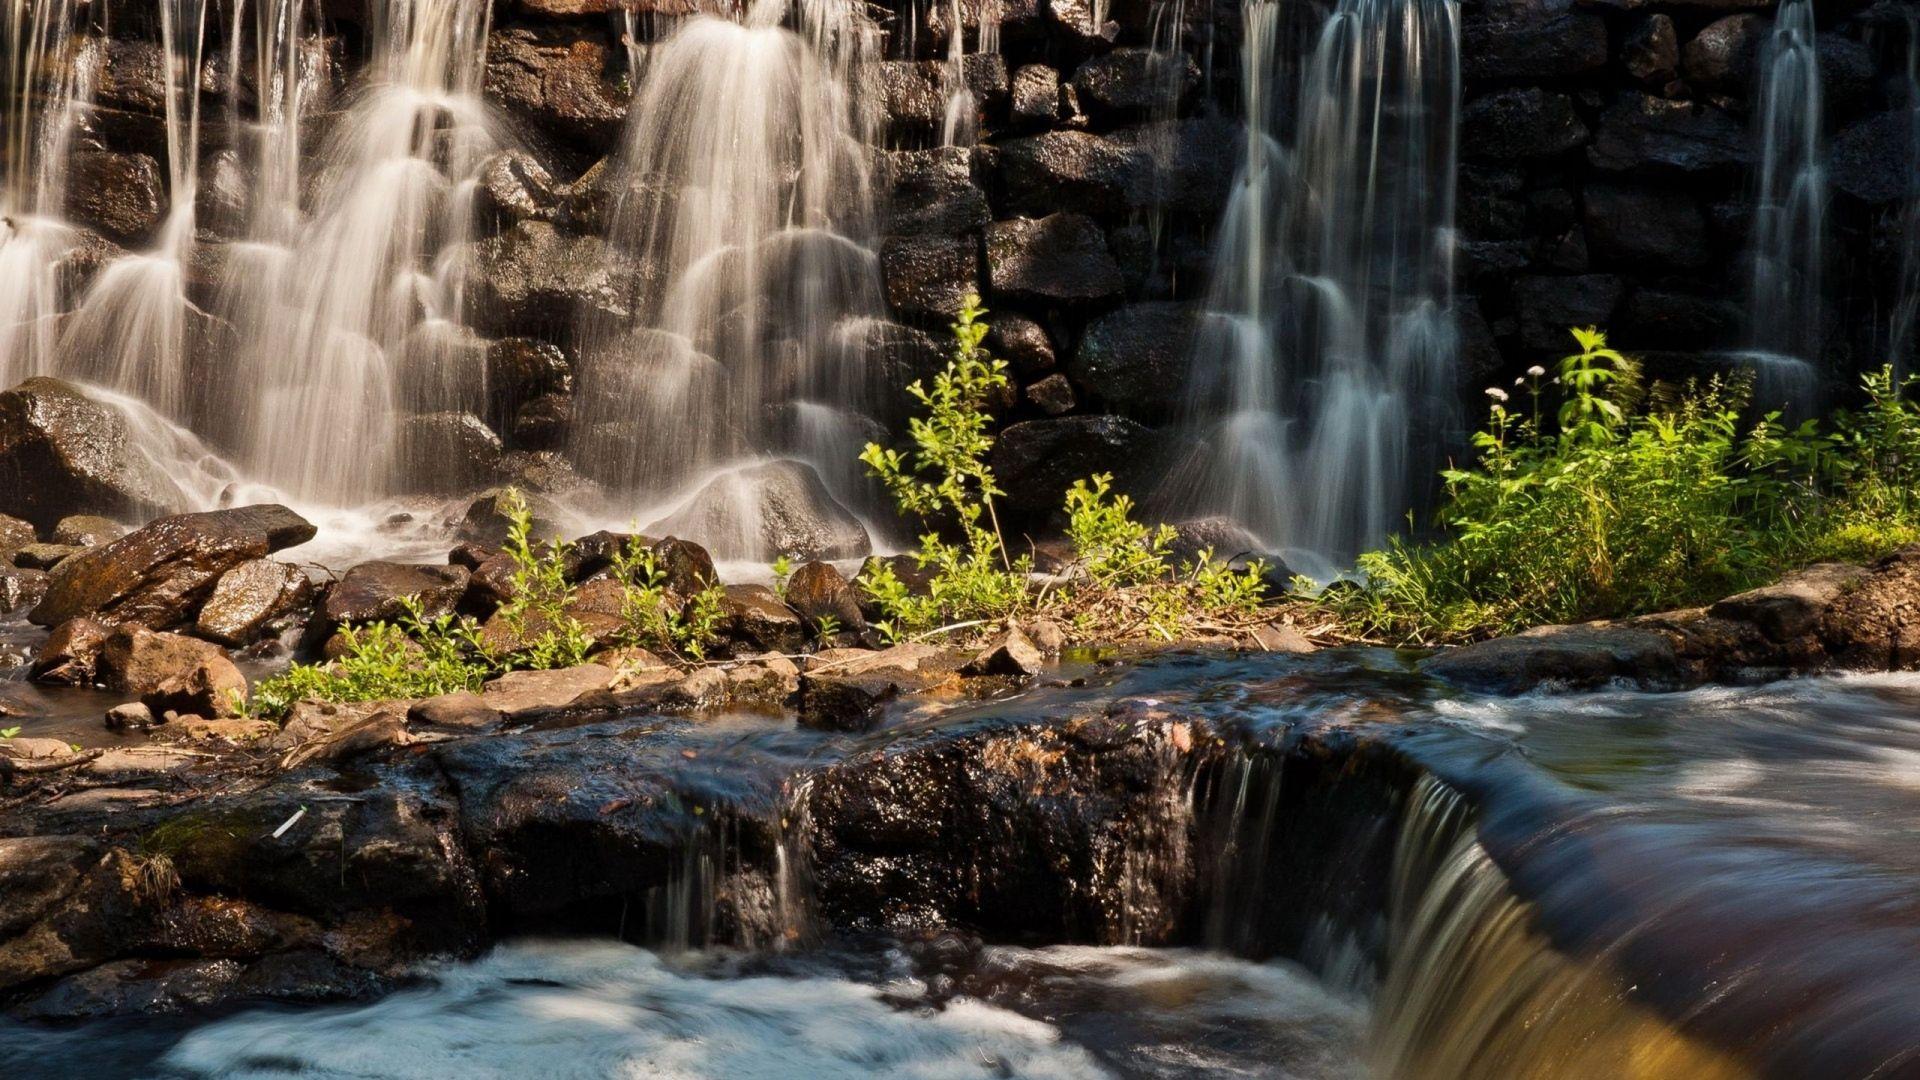 Download Wallpaper 1920x1080 Waterfall Foam River